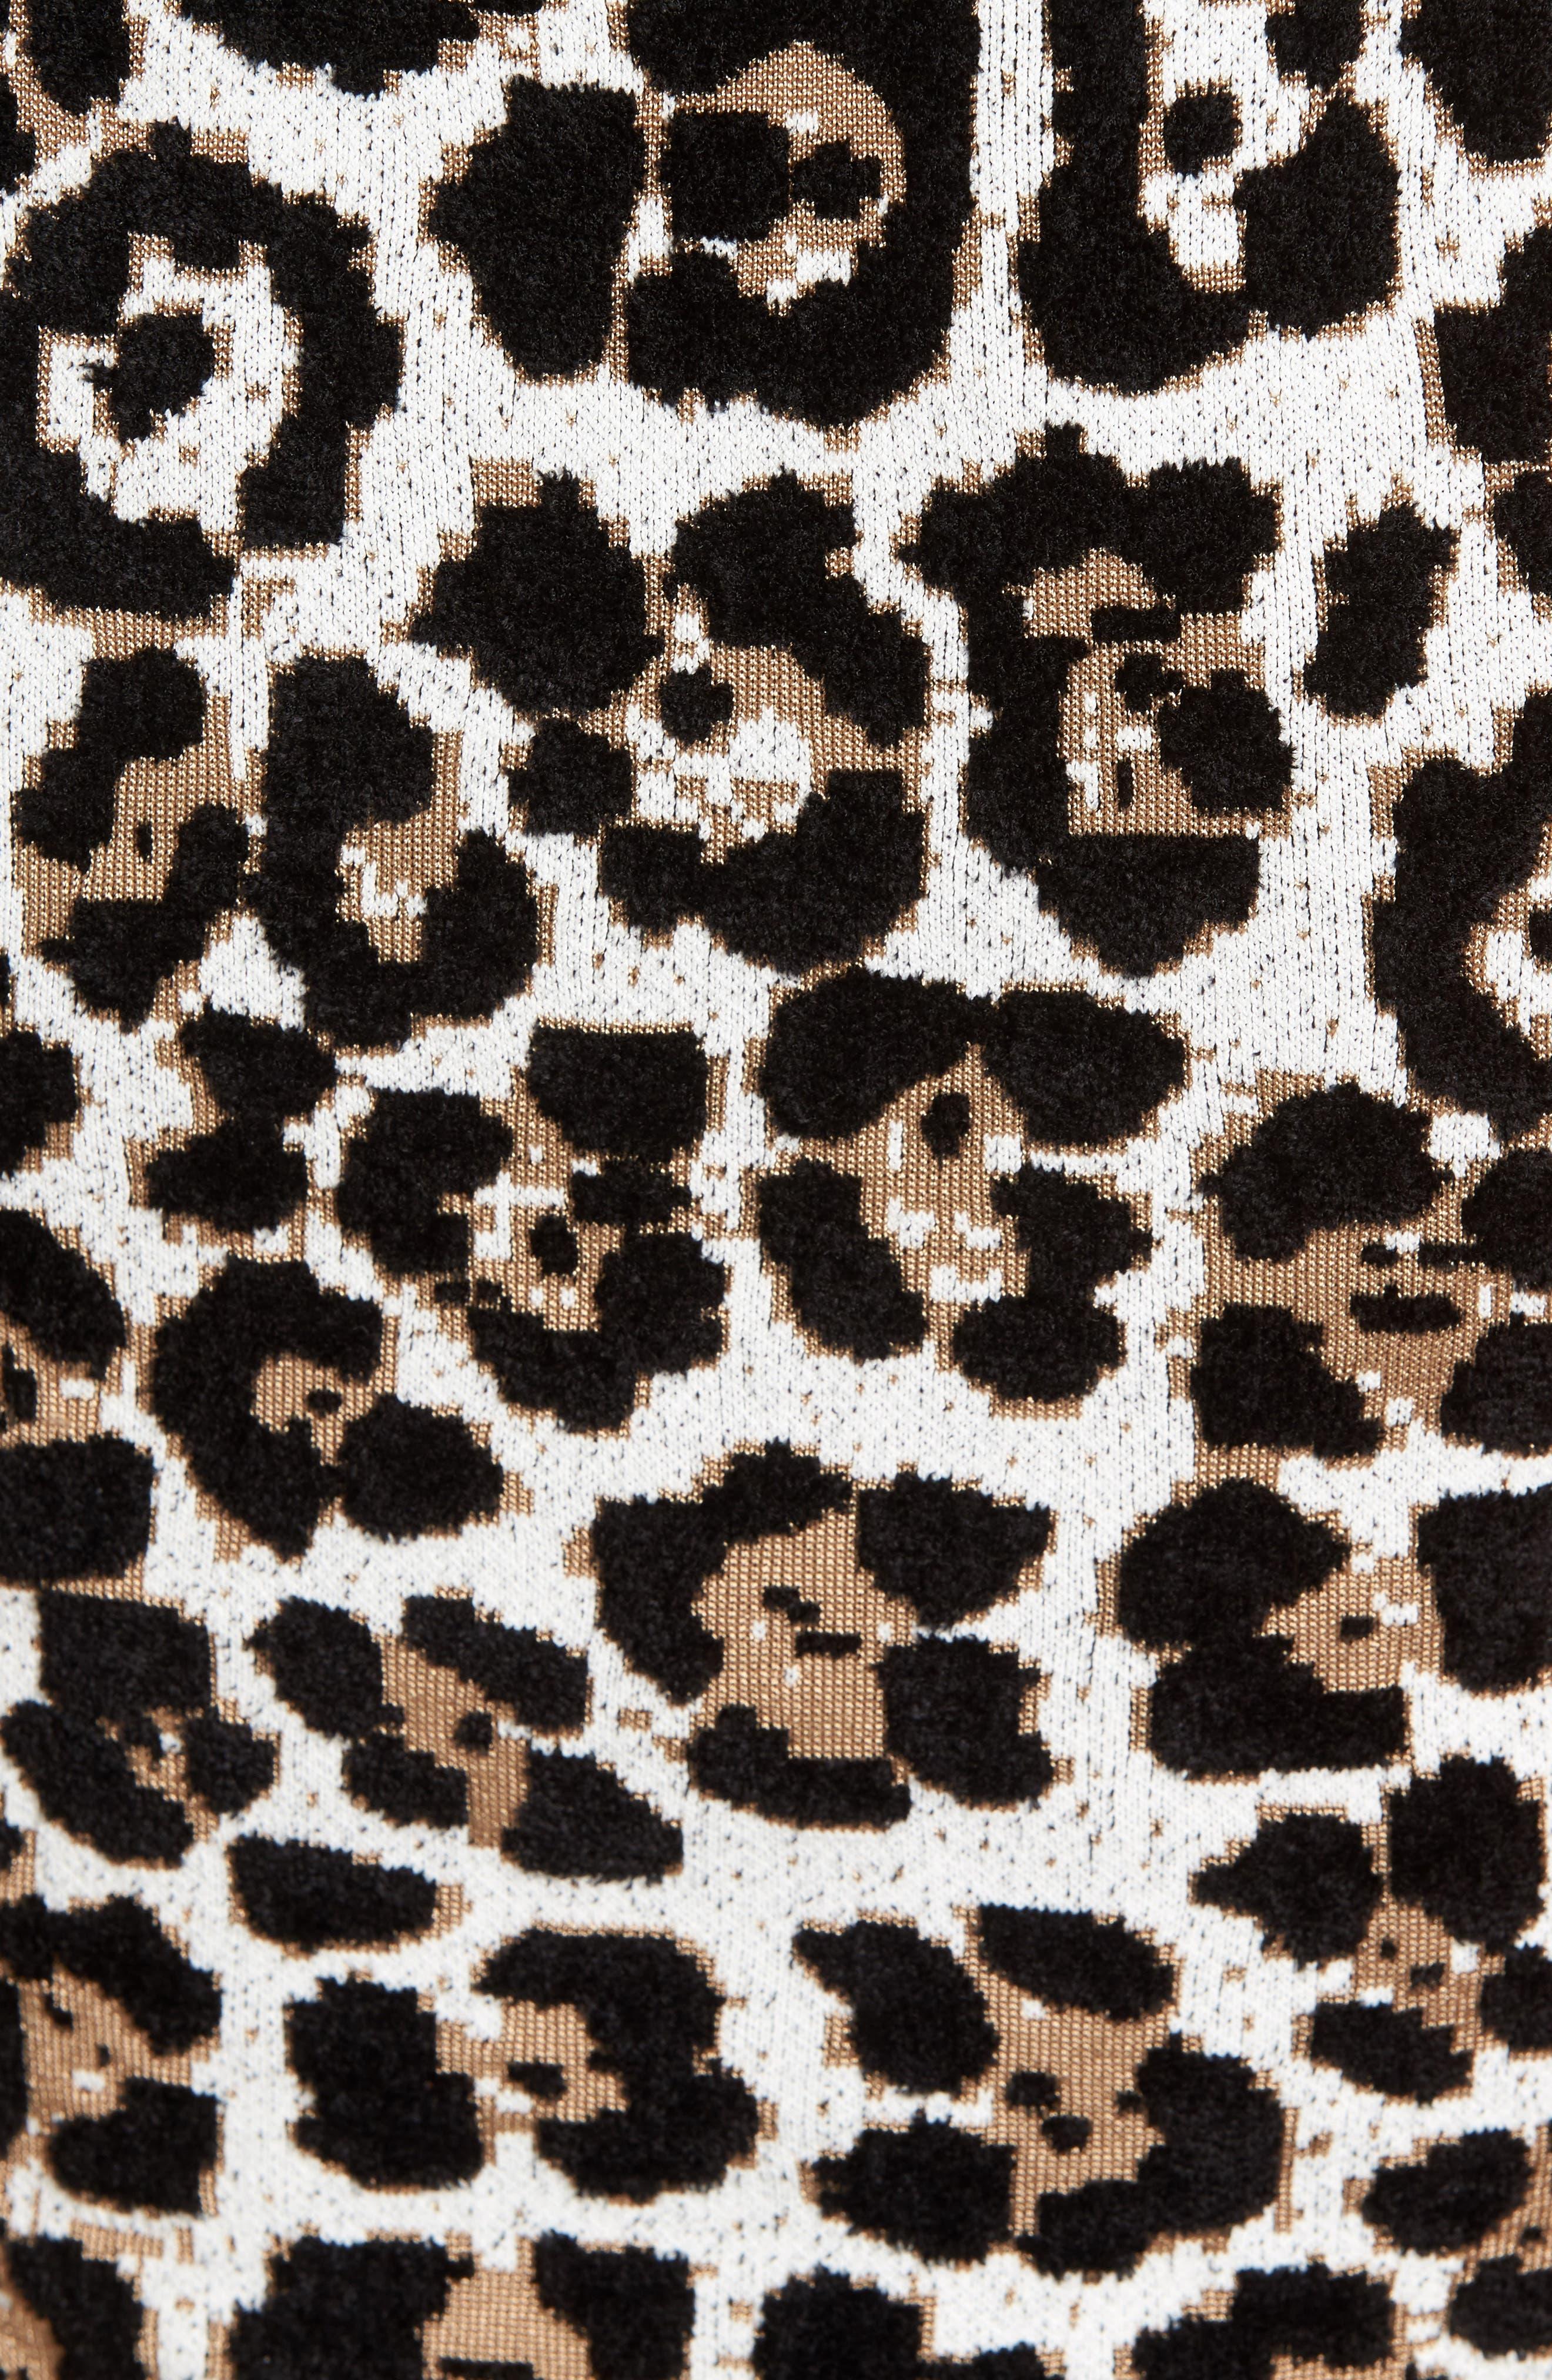 Animal Print Sheath Dress,                             Alternate thumbnail 5, color,                             201